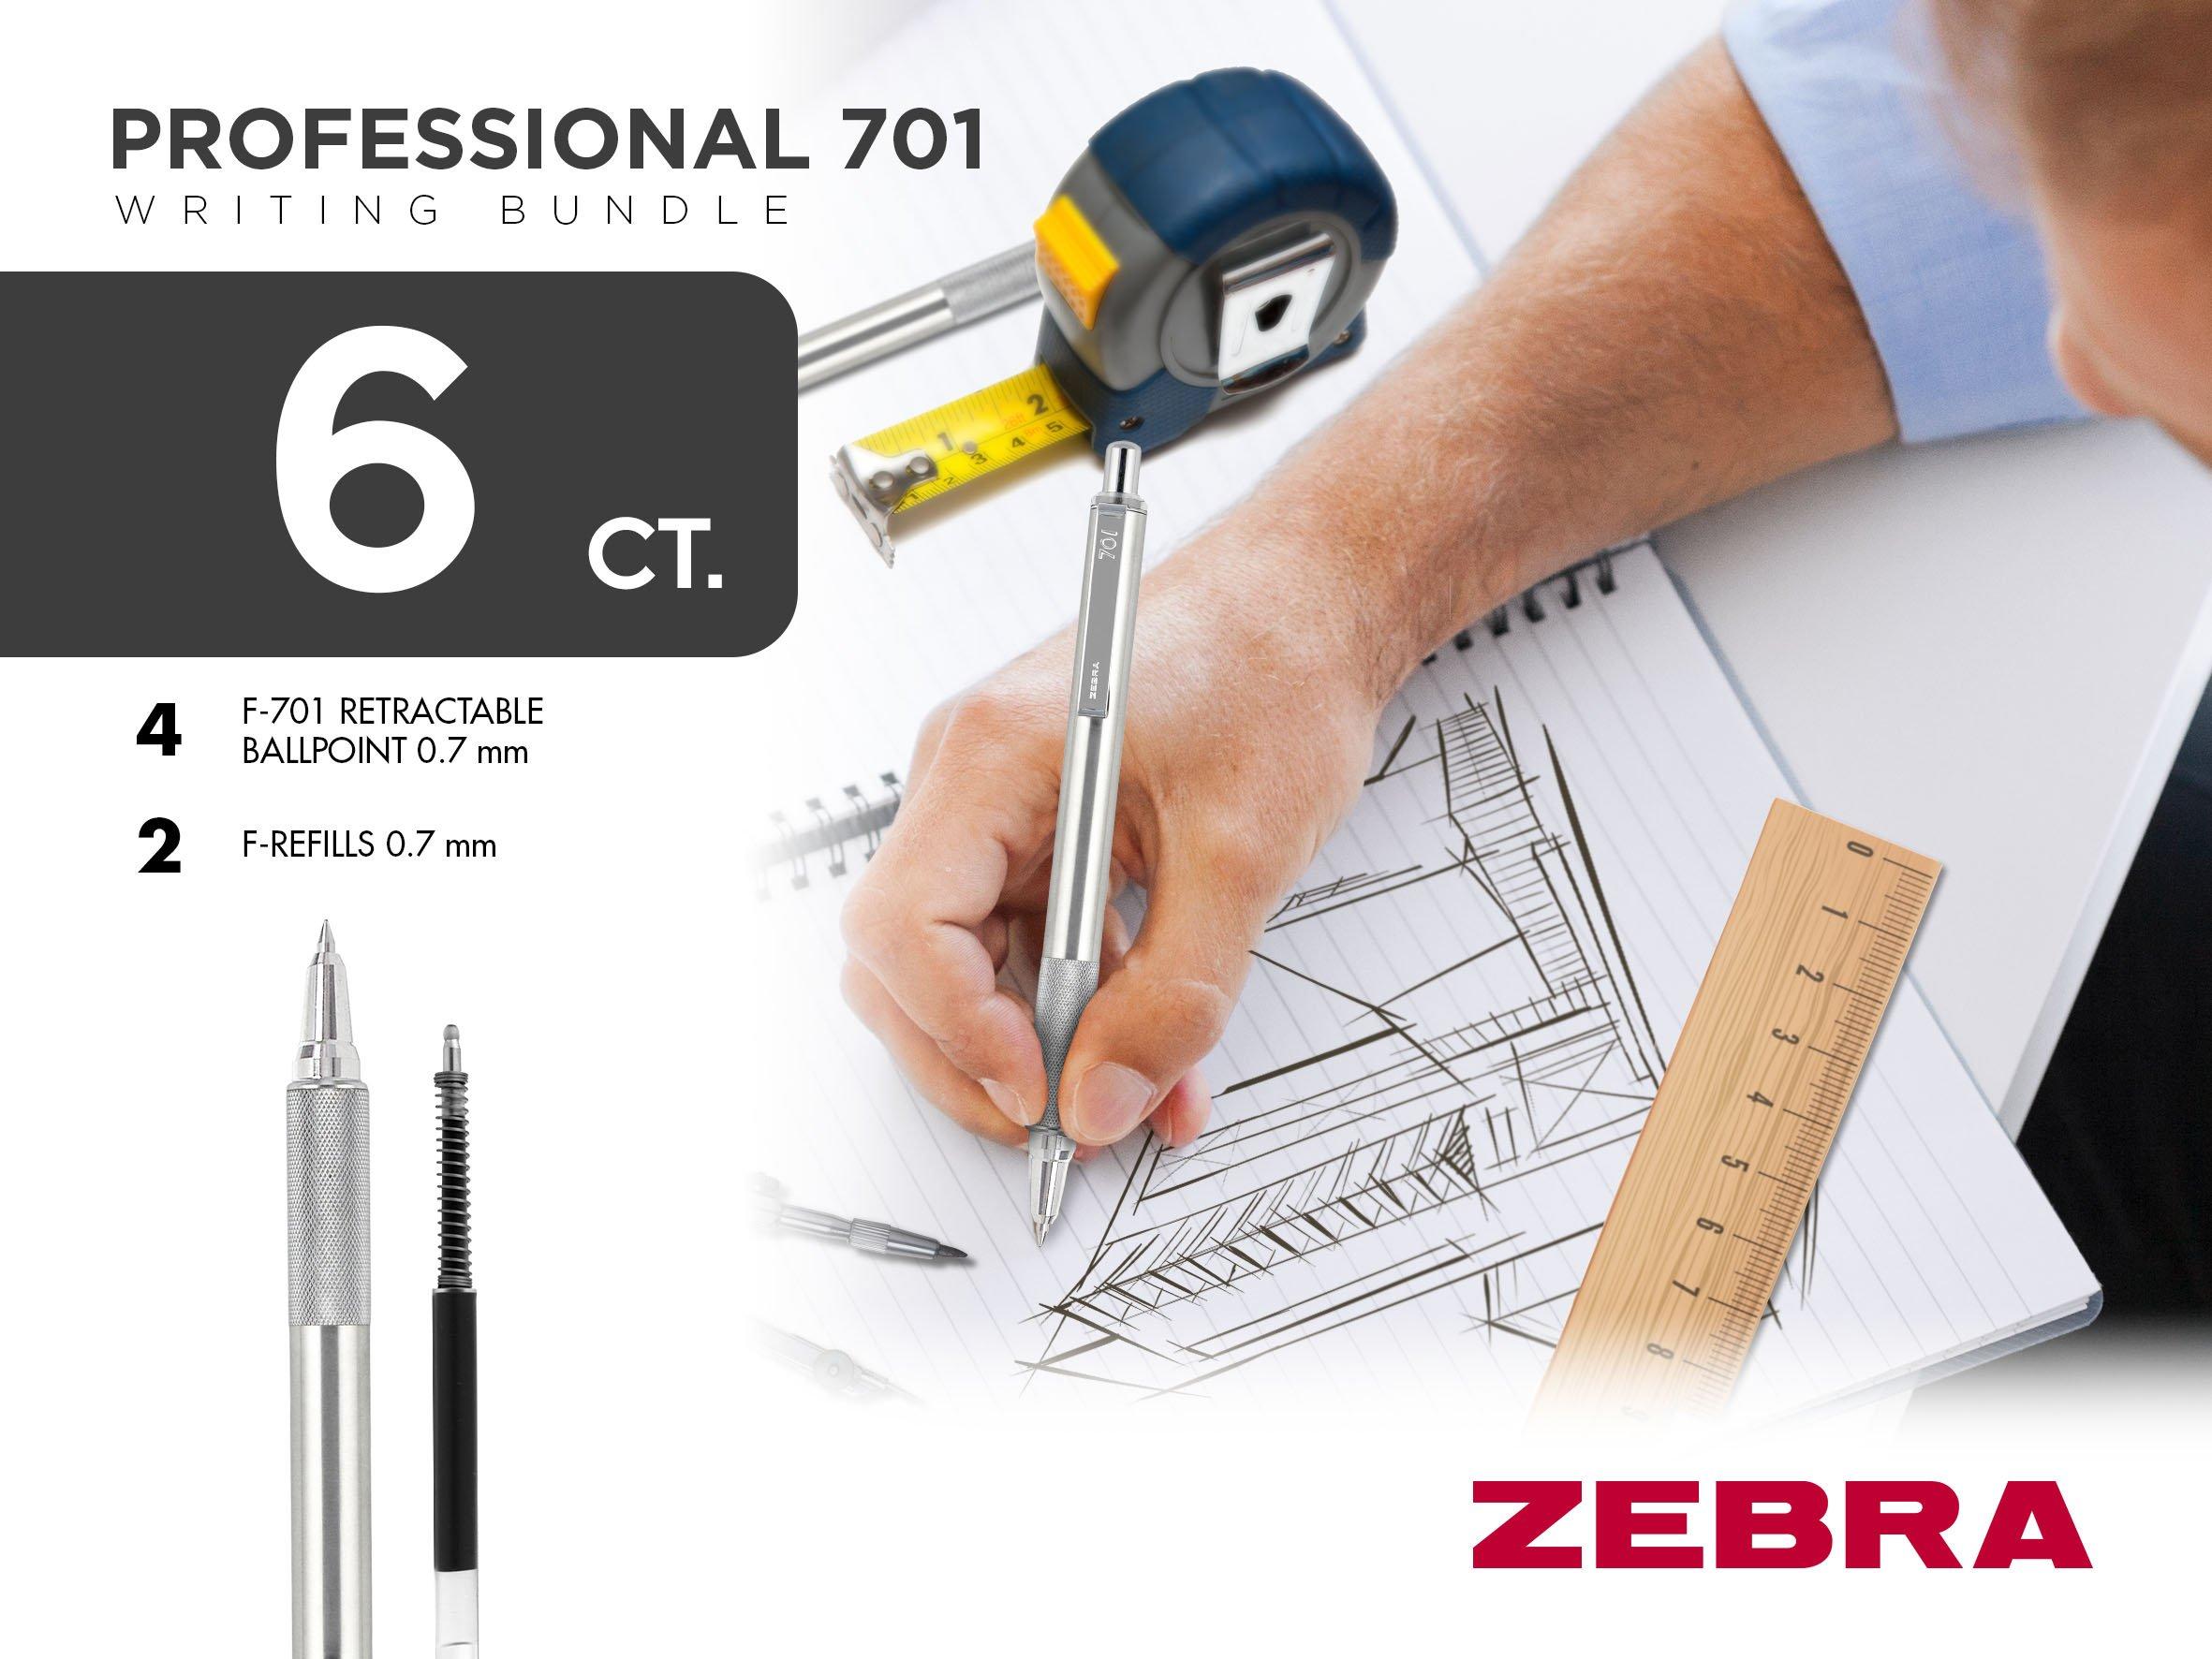 Zebra Pen 50113 Zebra Professional 701 Writing Bundle, F-701 Retractable Ballpoint Pen 0.8 mm with F-Refills 0.8mm, 6-Count by Zebra Pen (Image #2)